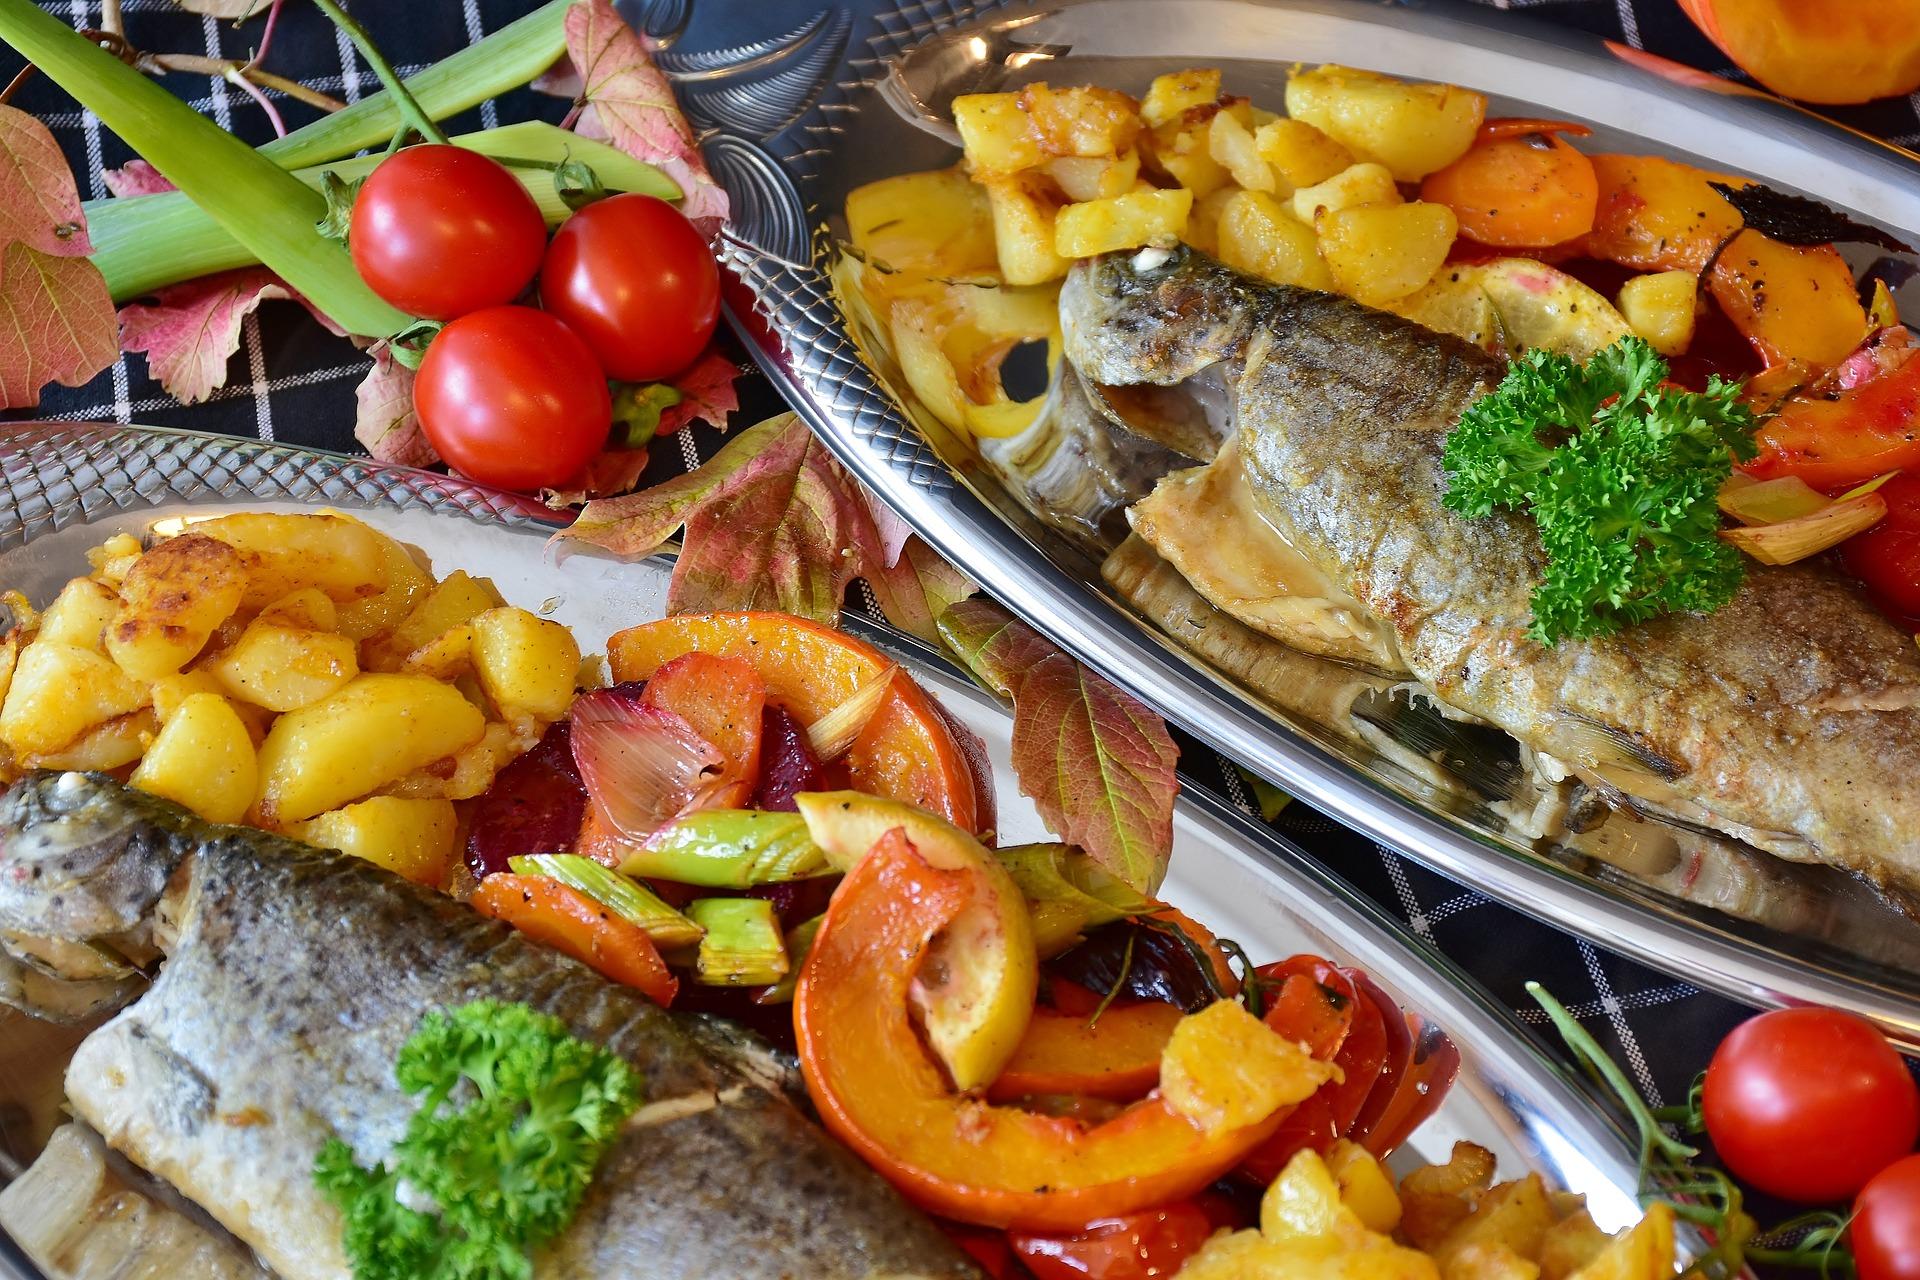 Dues truites cuinades | Pixabay